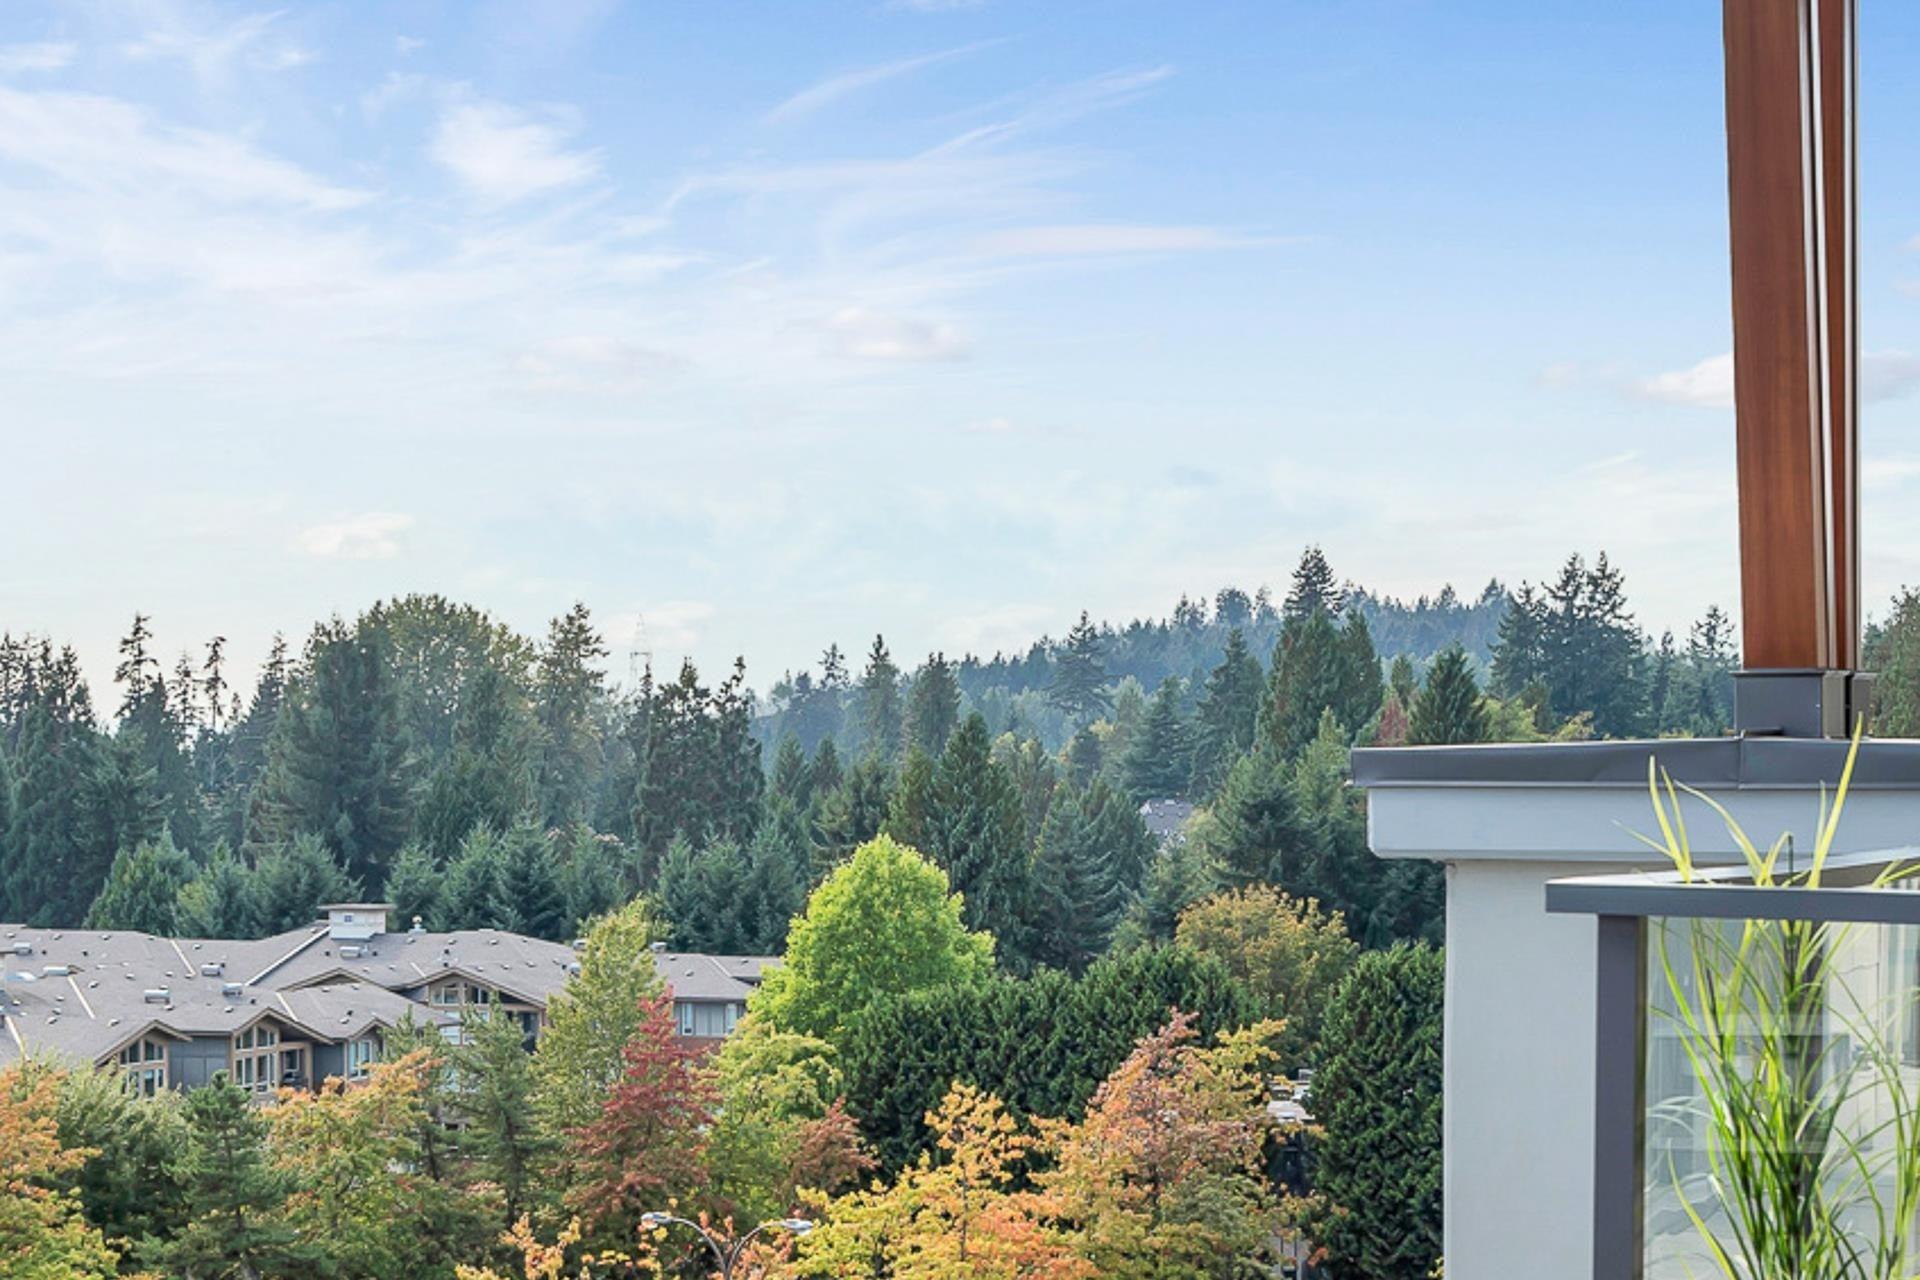 702 2780 VALLEY CENTRE AVENUE - Lynn Valley Apartment/Condo for sale, 3 Bedrooms (R2622279) - #29